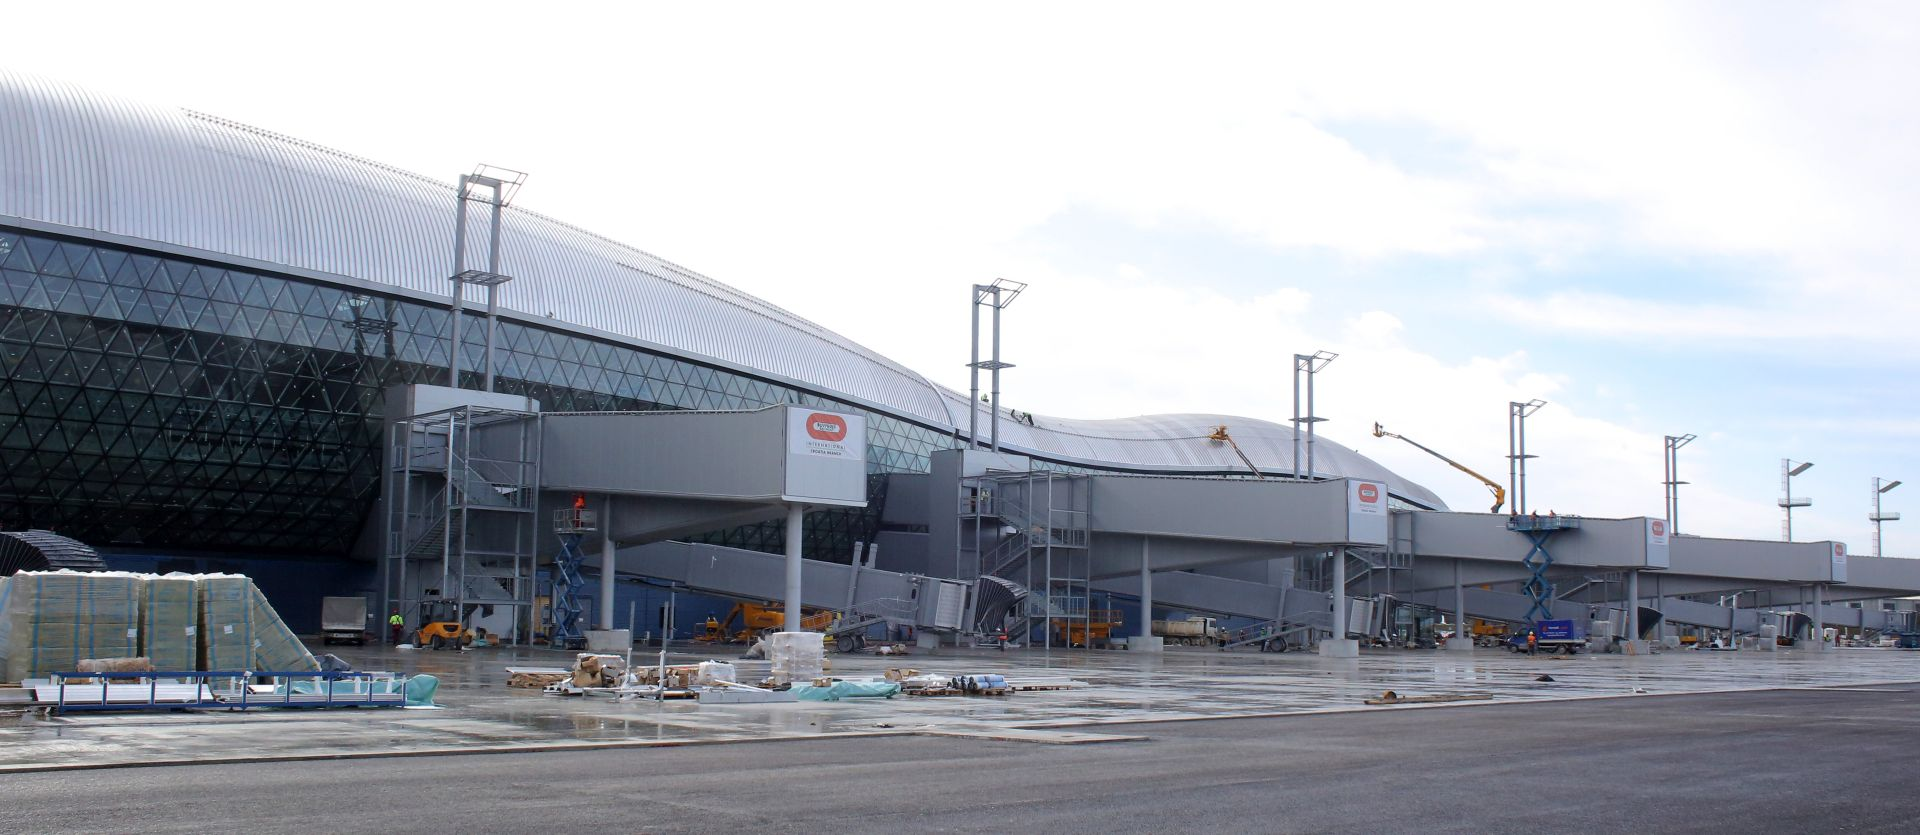 FOTO USVOJEN PRIJEDLOG: Nova zagrebačka zračna luka nosit će ime dr. Franje Tuđmana